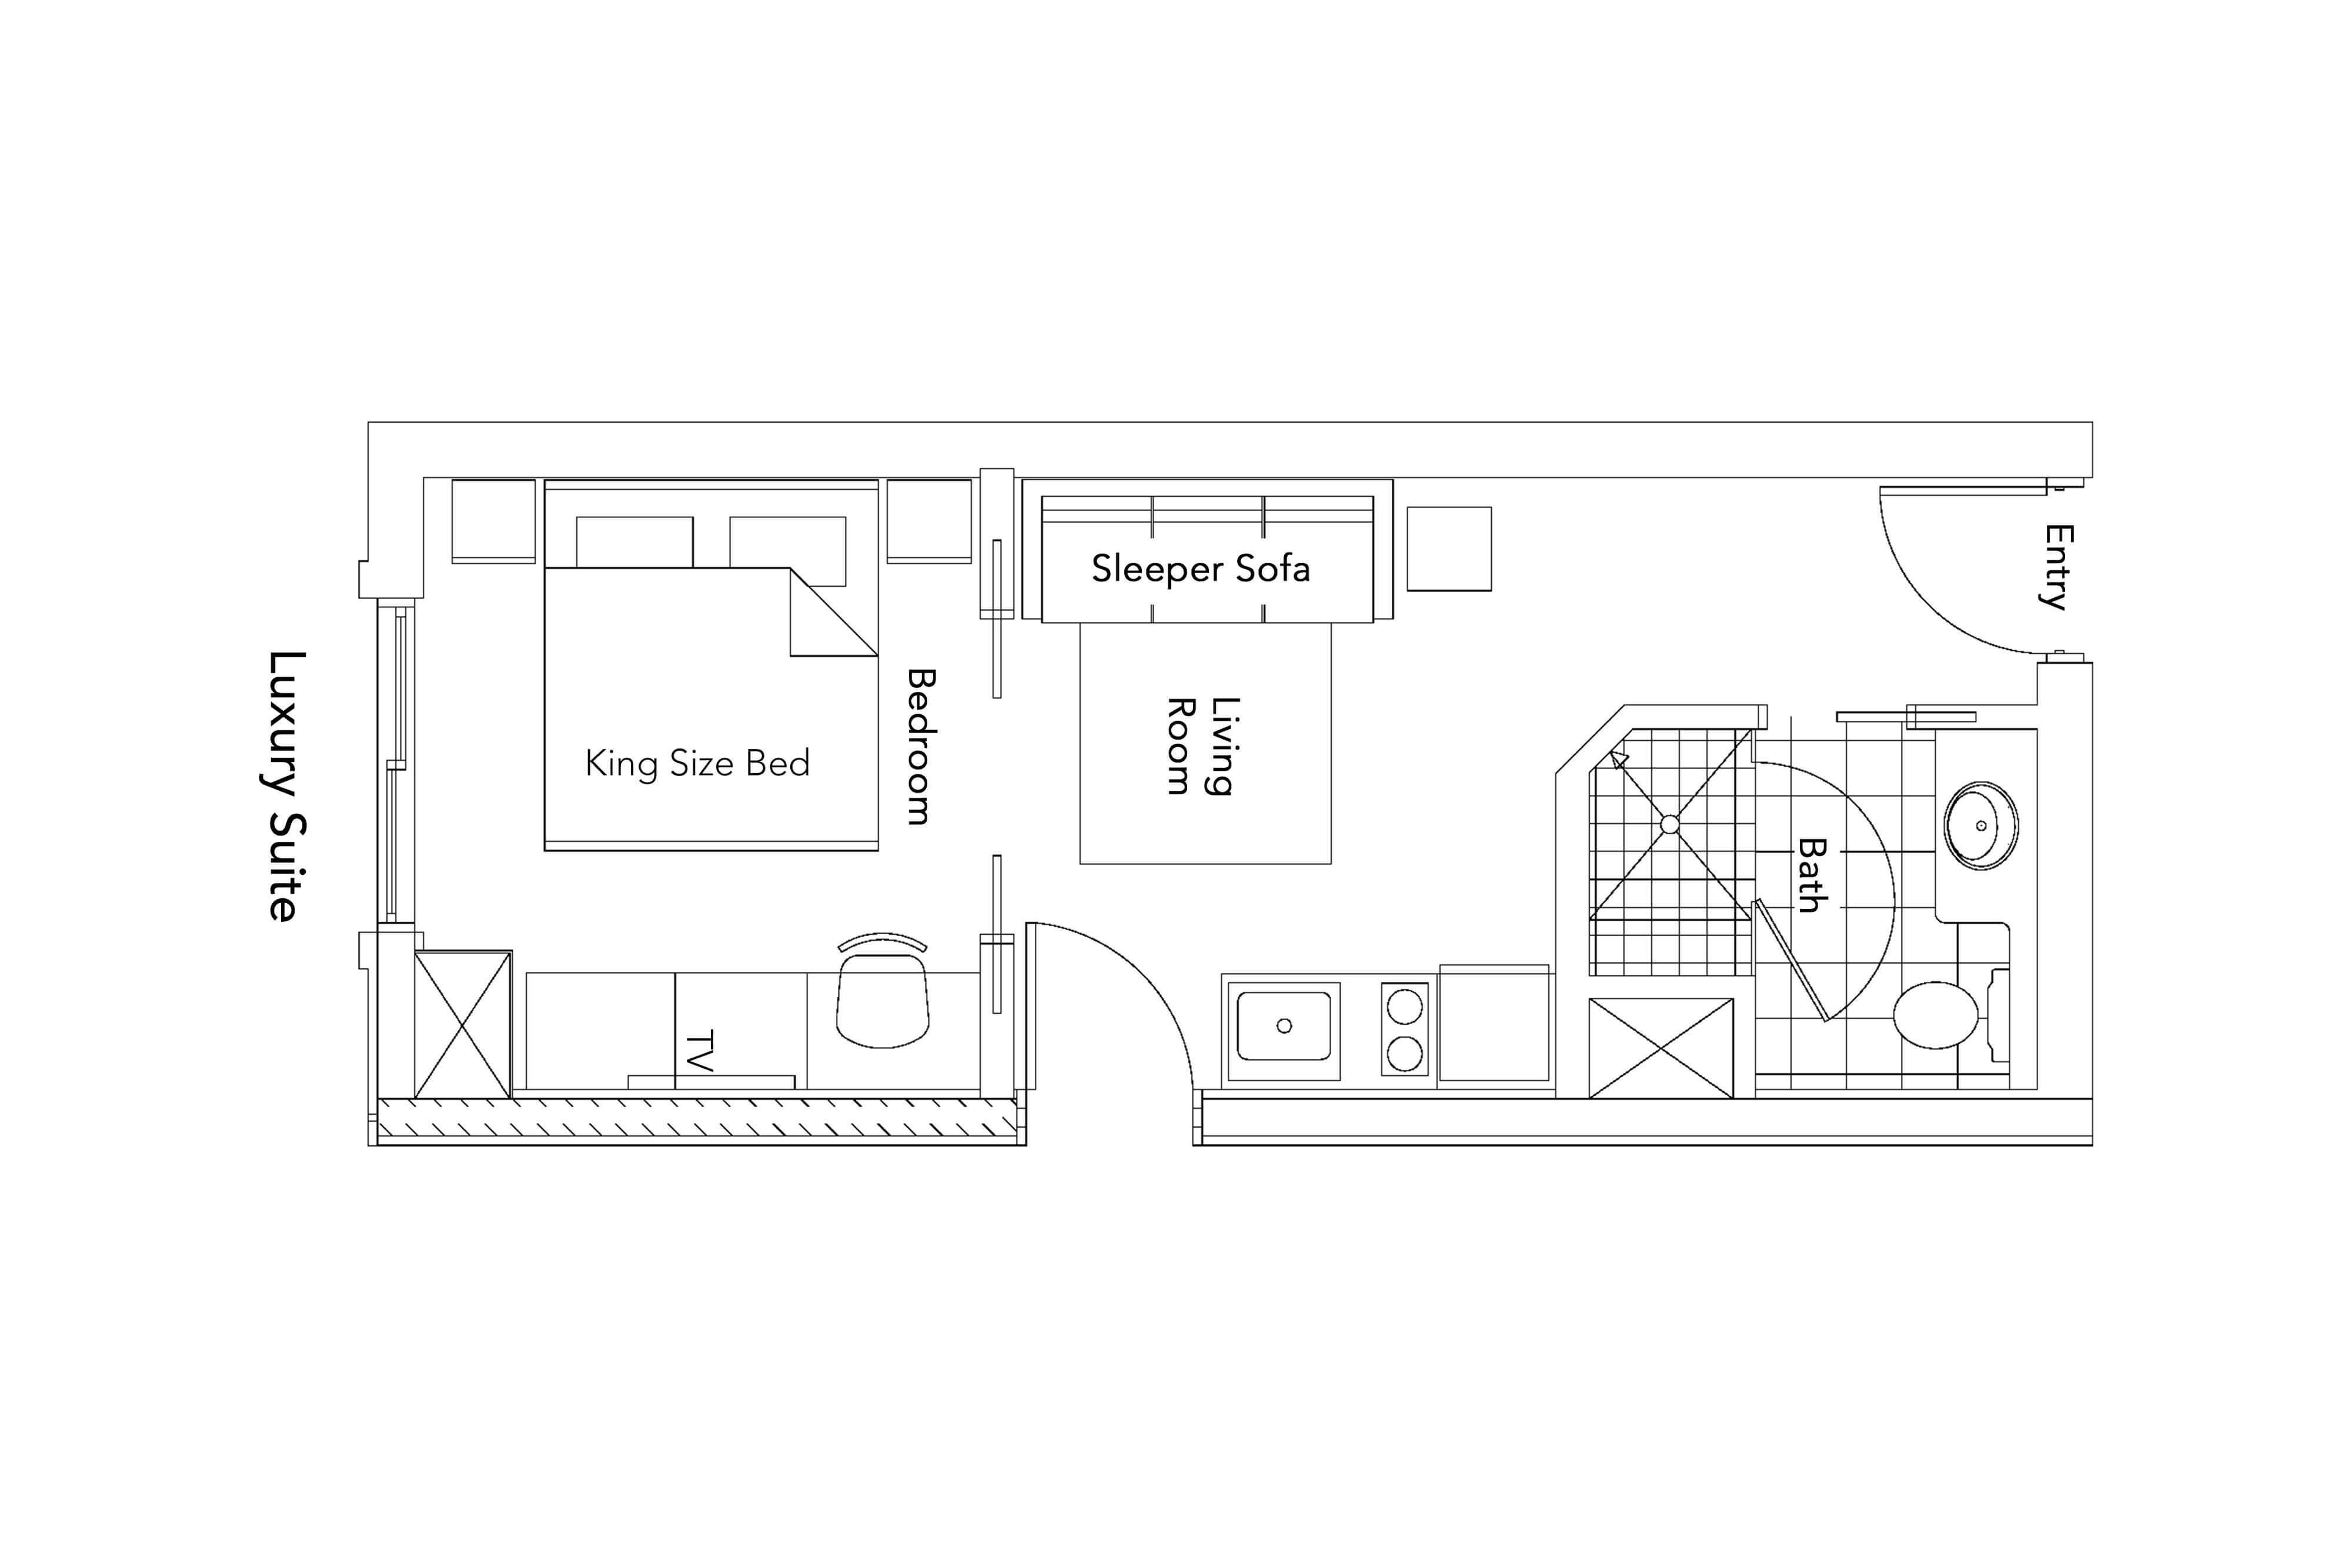 Luxury Suite Floorplan of our Park City Resort in Utah | Westgate Park City Resort & Spa | Westgate Resorts